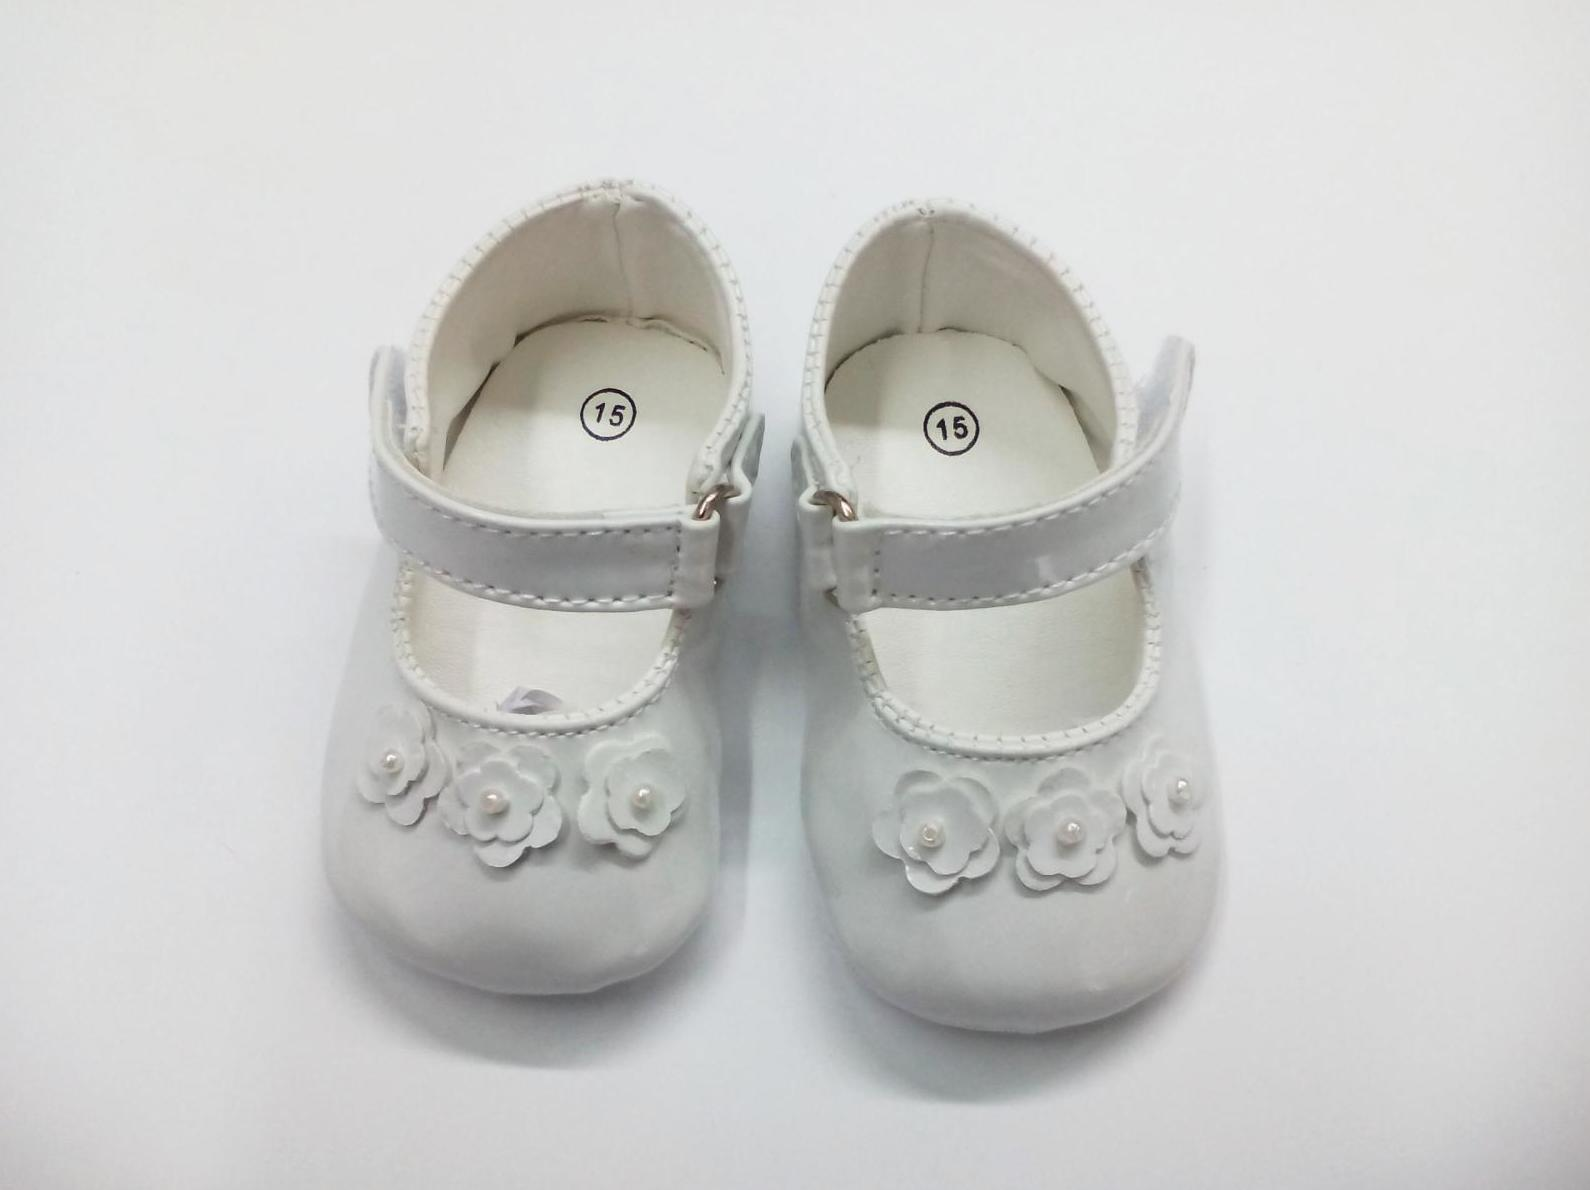 Zapato de bebé niña sin suela blanco con flores